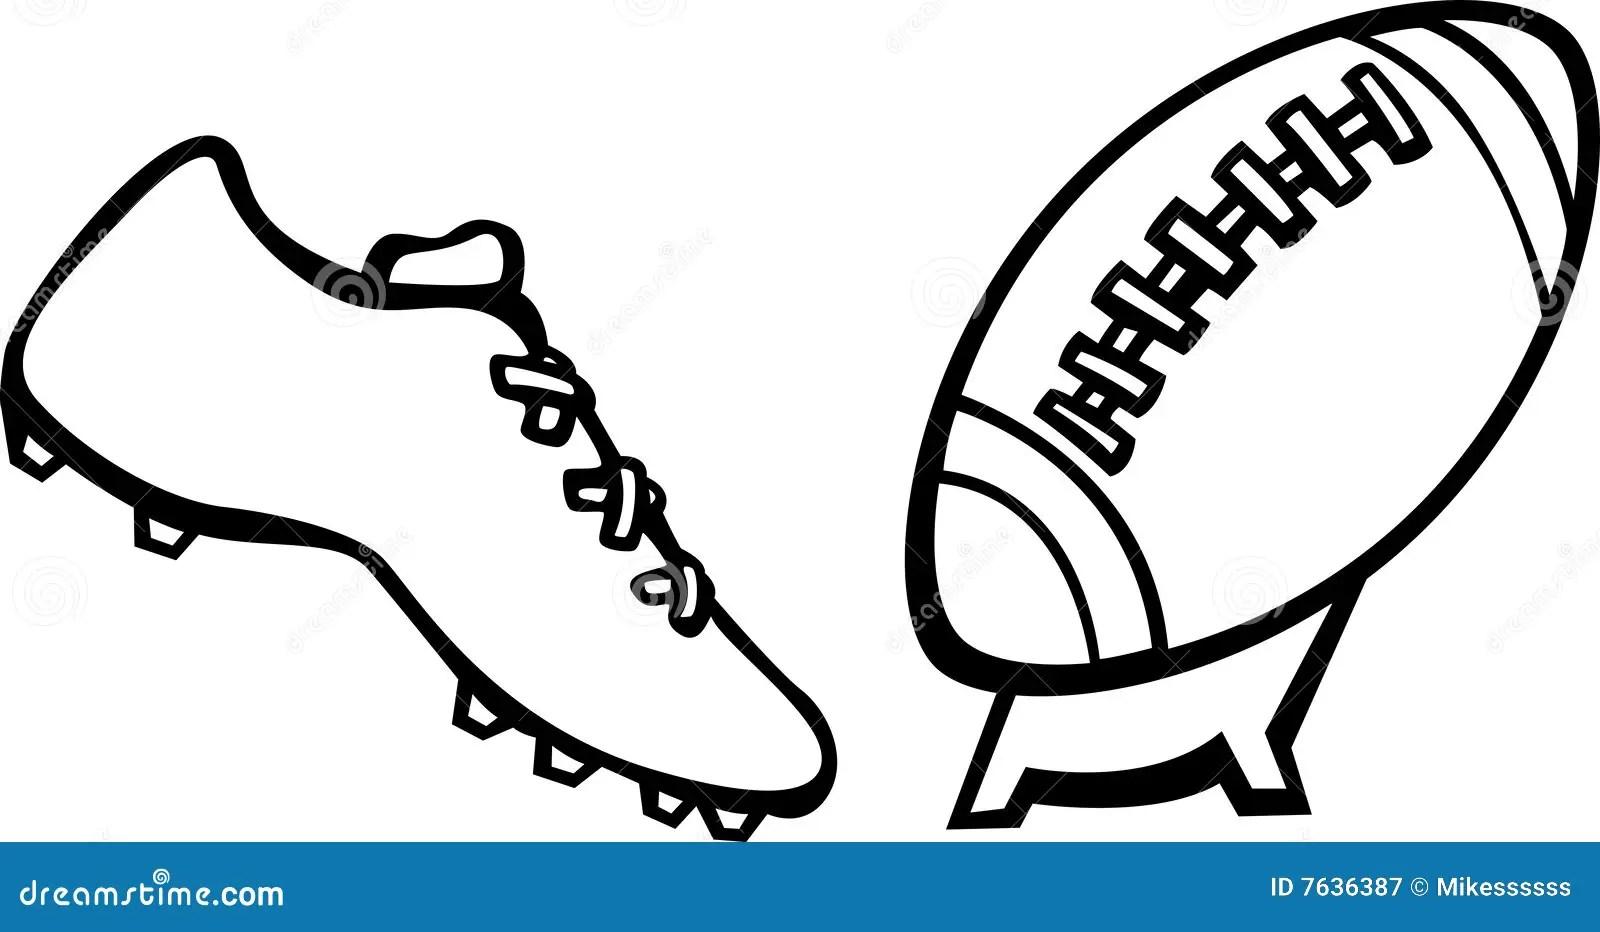 Football Kick Vector Illustration Royalty Free Stock